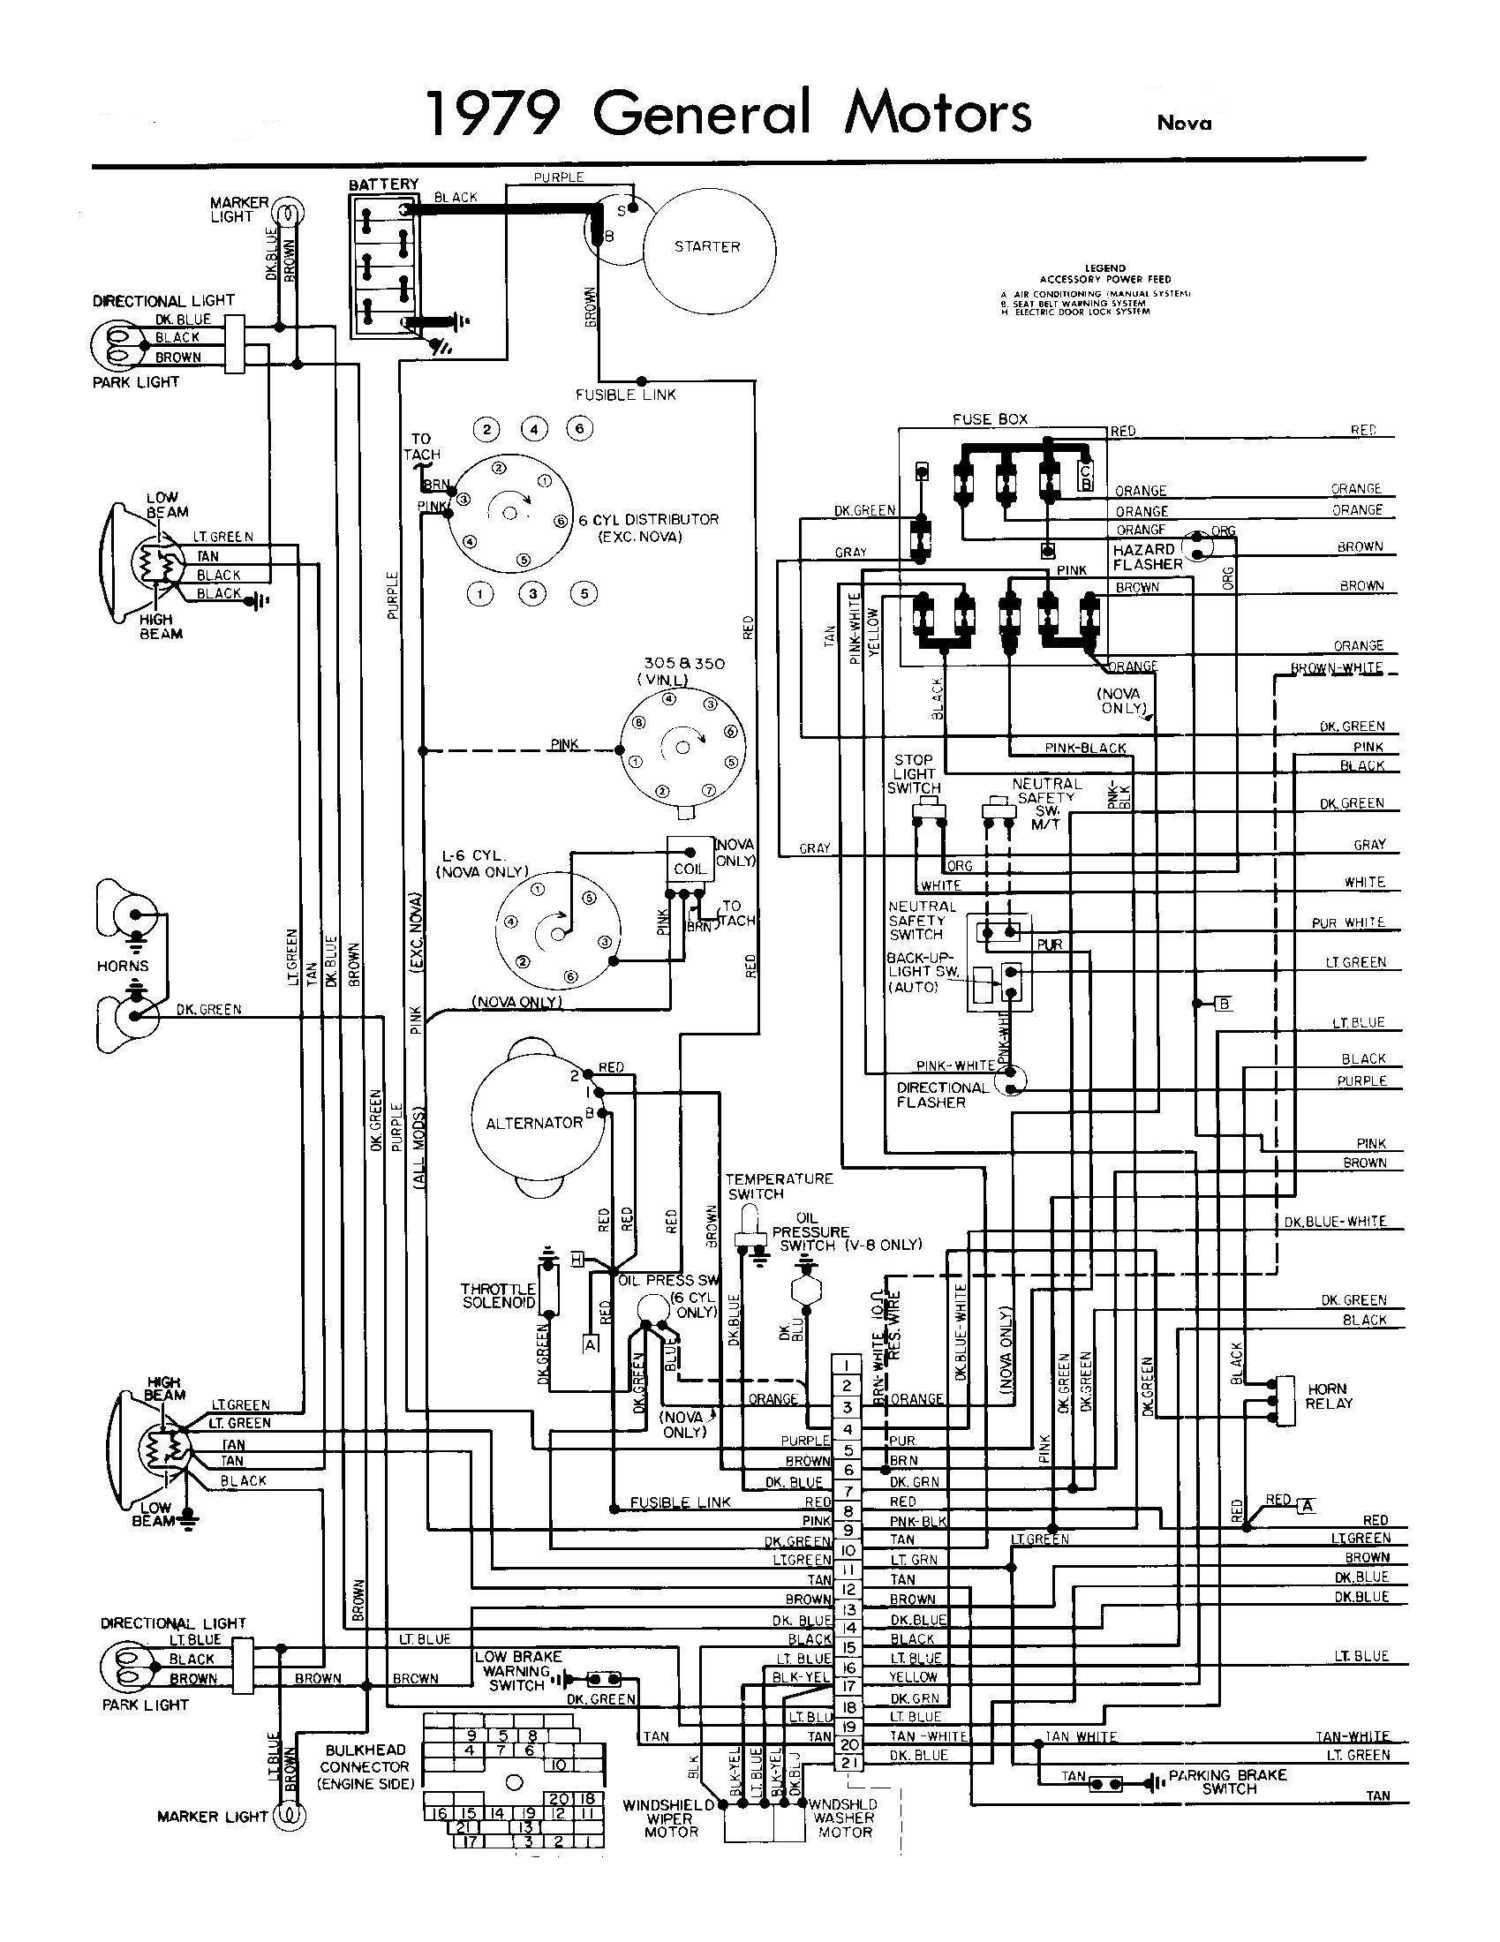 1979 Chevy Truck Radio Wiring Diagram 1979 Gmc Truck Wiring Diagram Wiring Diagram Paper Of 1979 Chevy Truck Radio Wiring Diagram